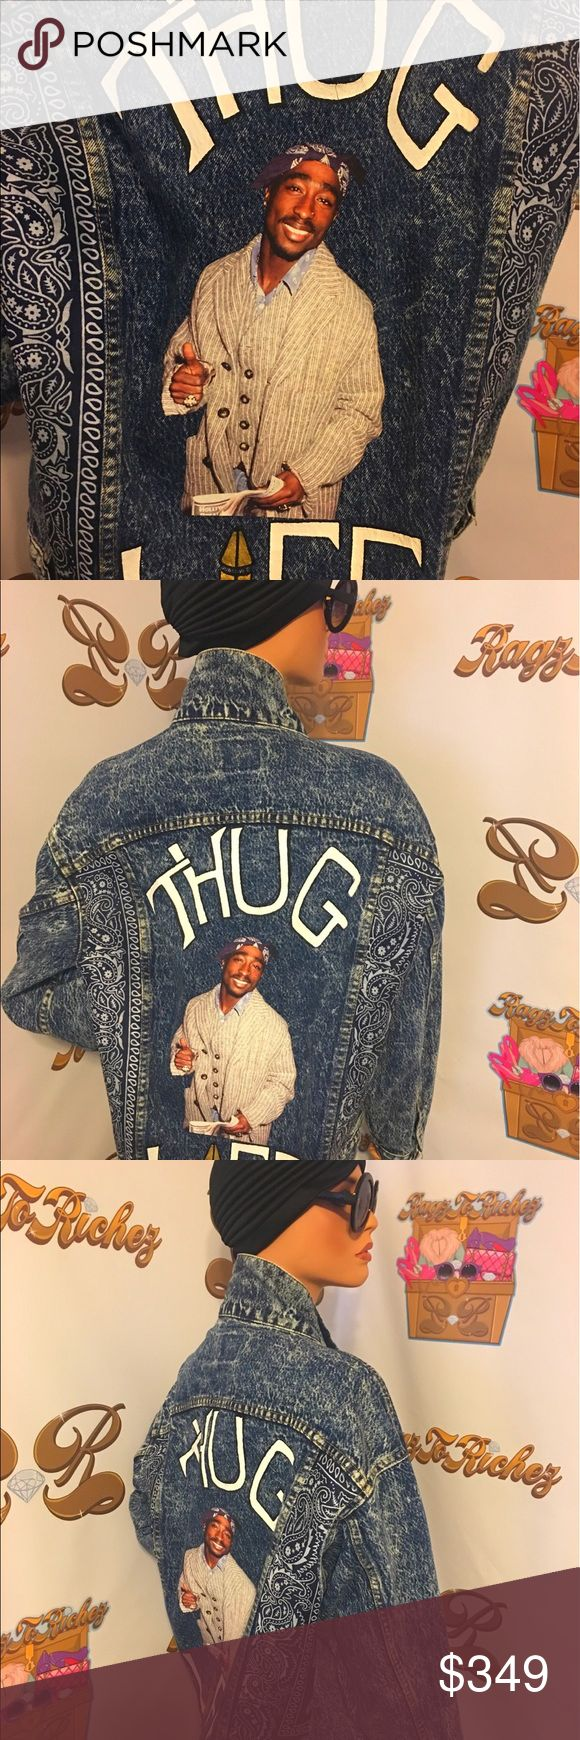 Tupac Thug life Custom Jacket. PRICE IS FIRM! Up for sale is this custom hand painted Tupac thug life bandanna jacket on Vintage Levi. On Sale till June 16. Levi's Jackets & Coats Bomber & Varsity